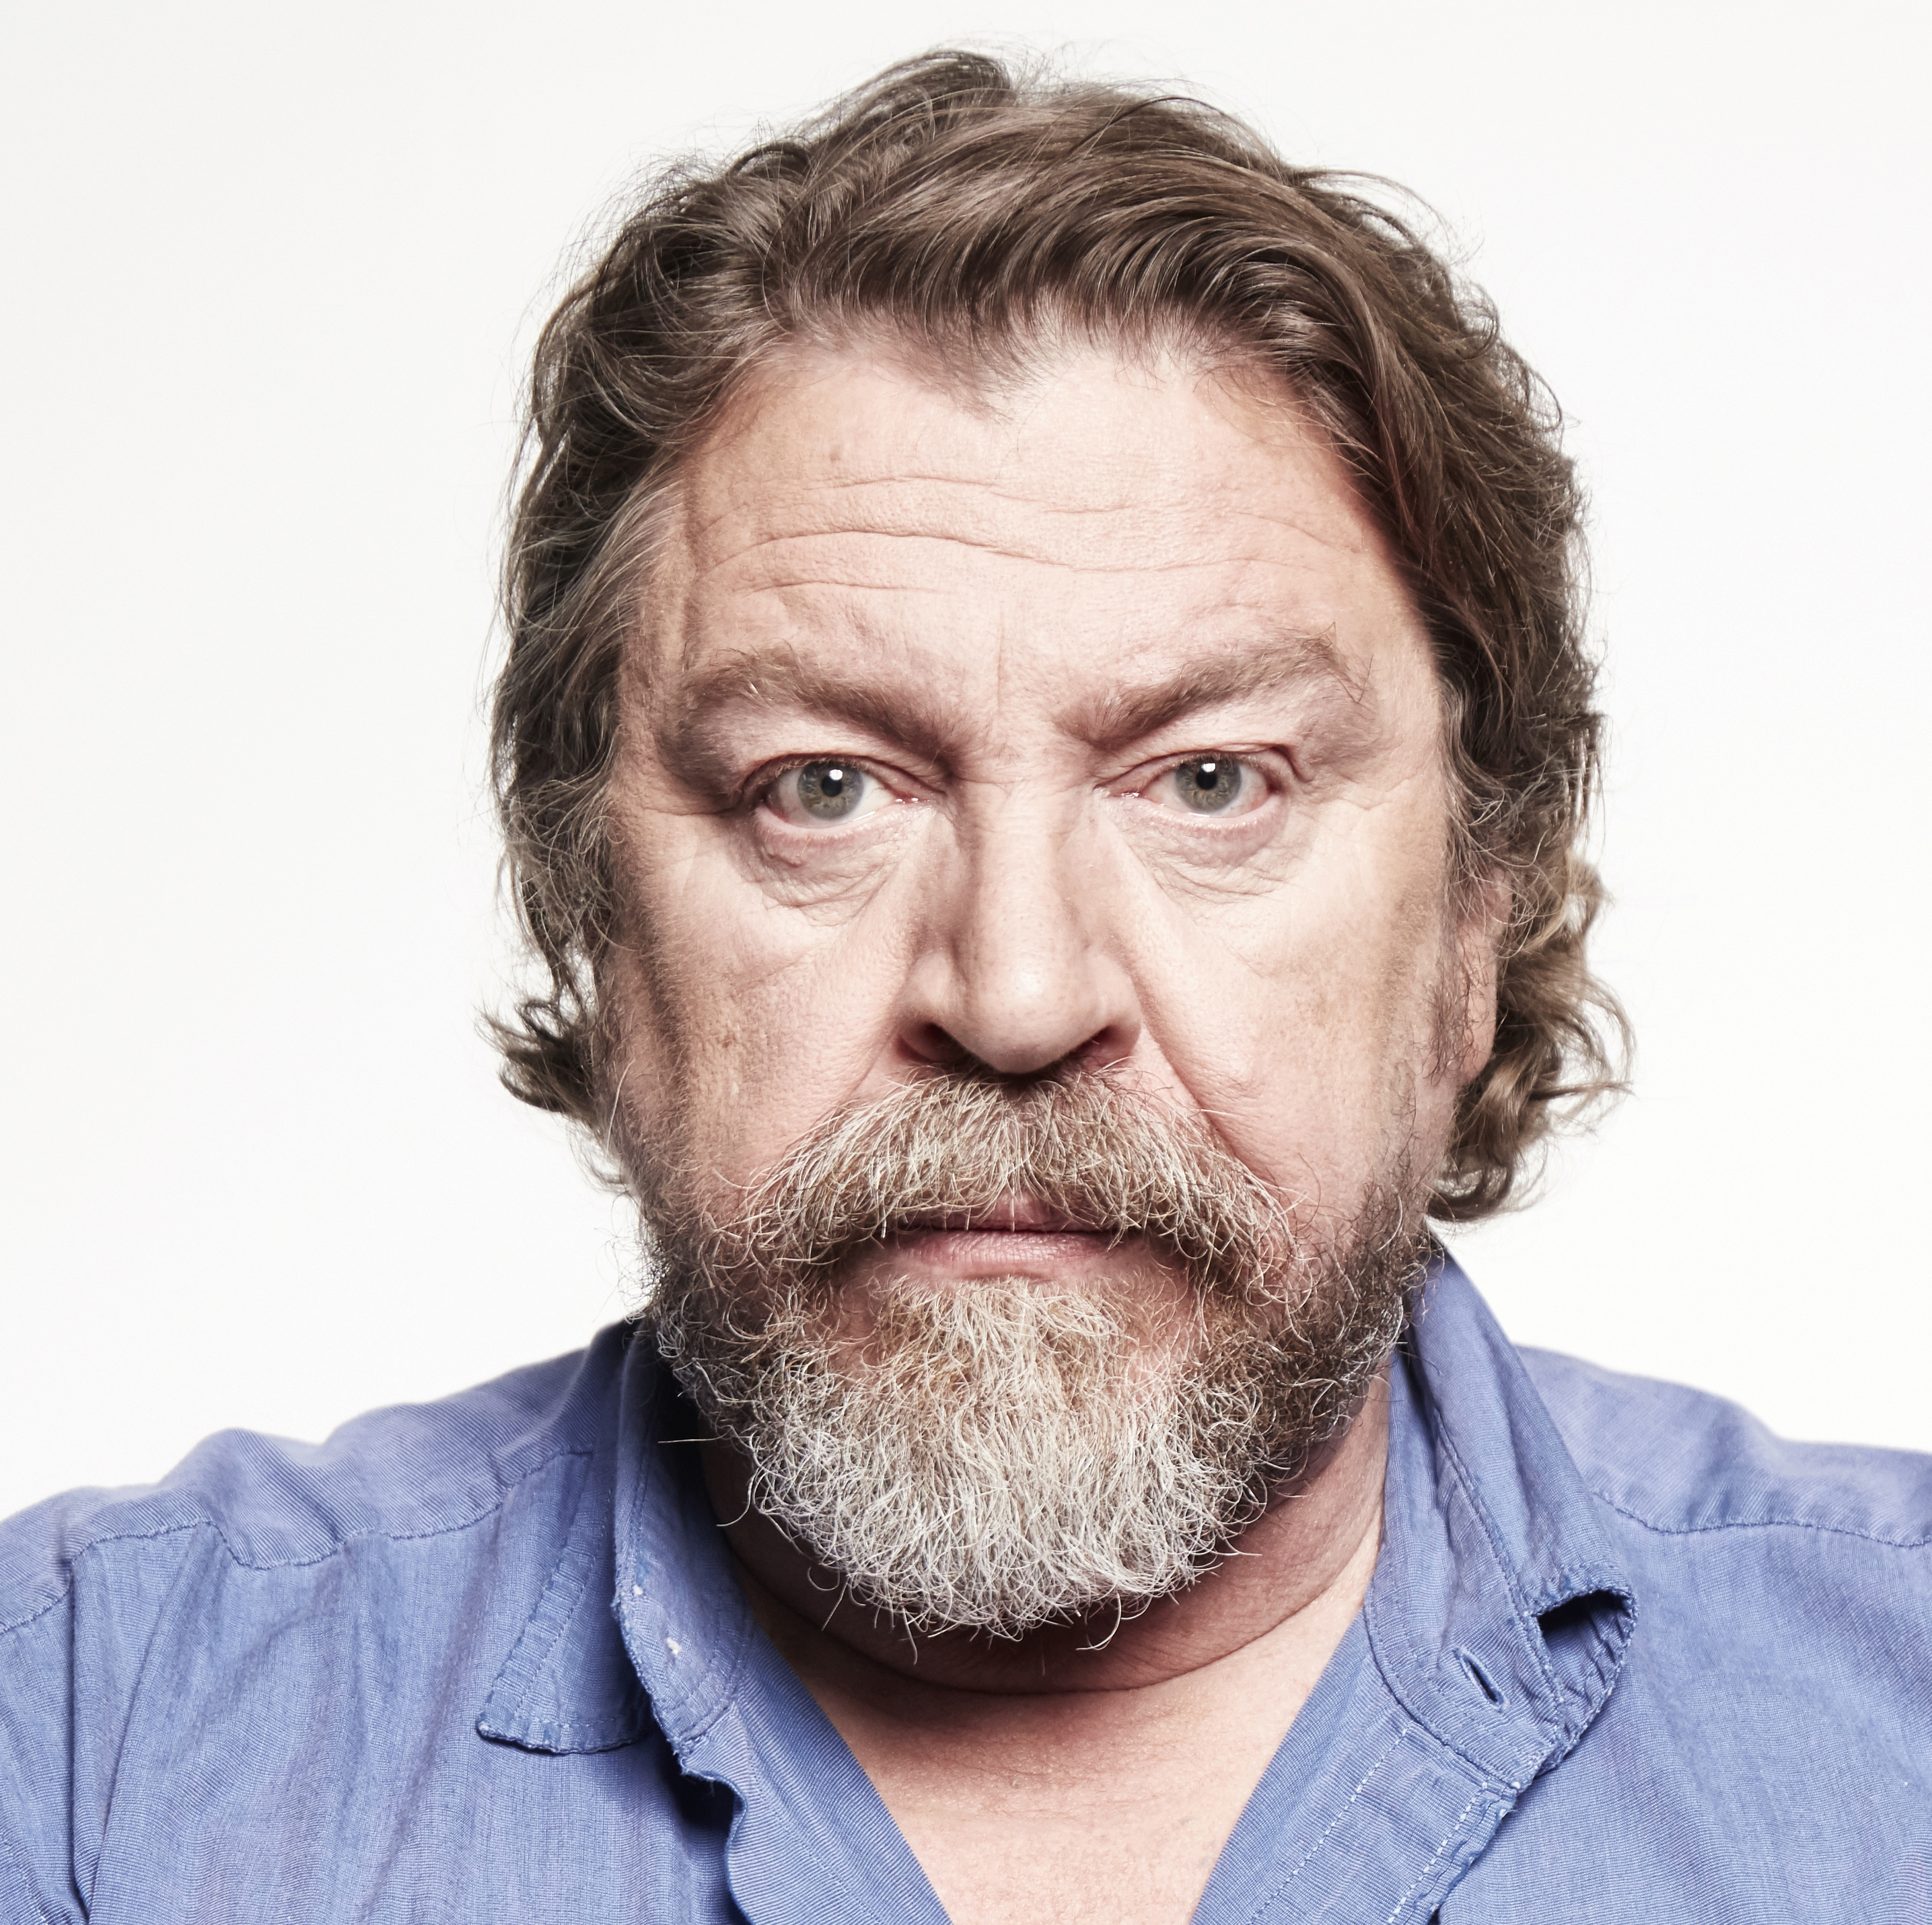 Armin Rohde, Schauspieler, fotografie tomas rodriguez köln, studio köln